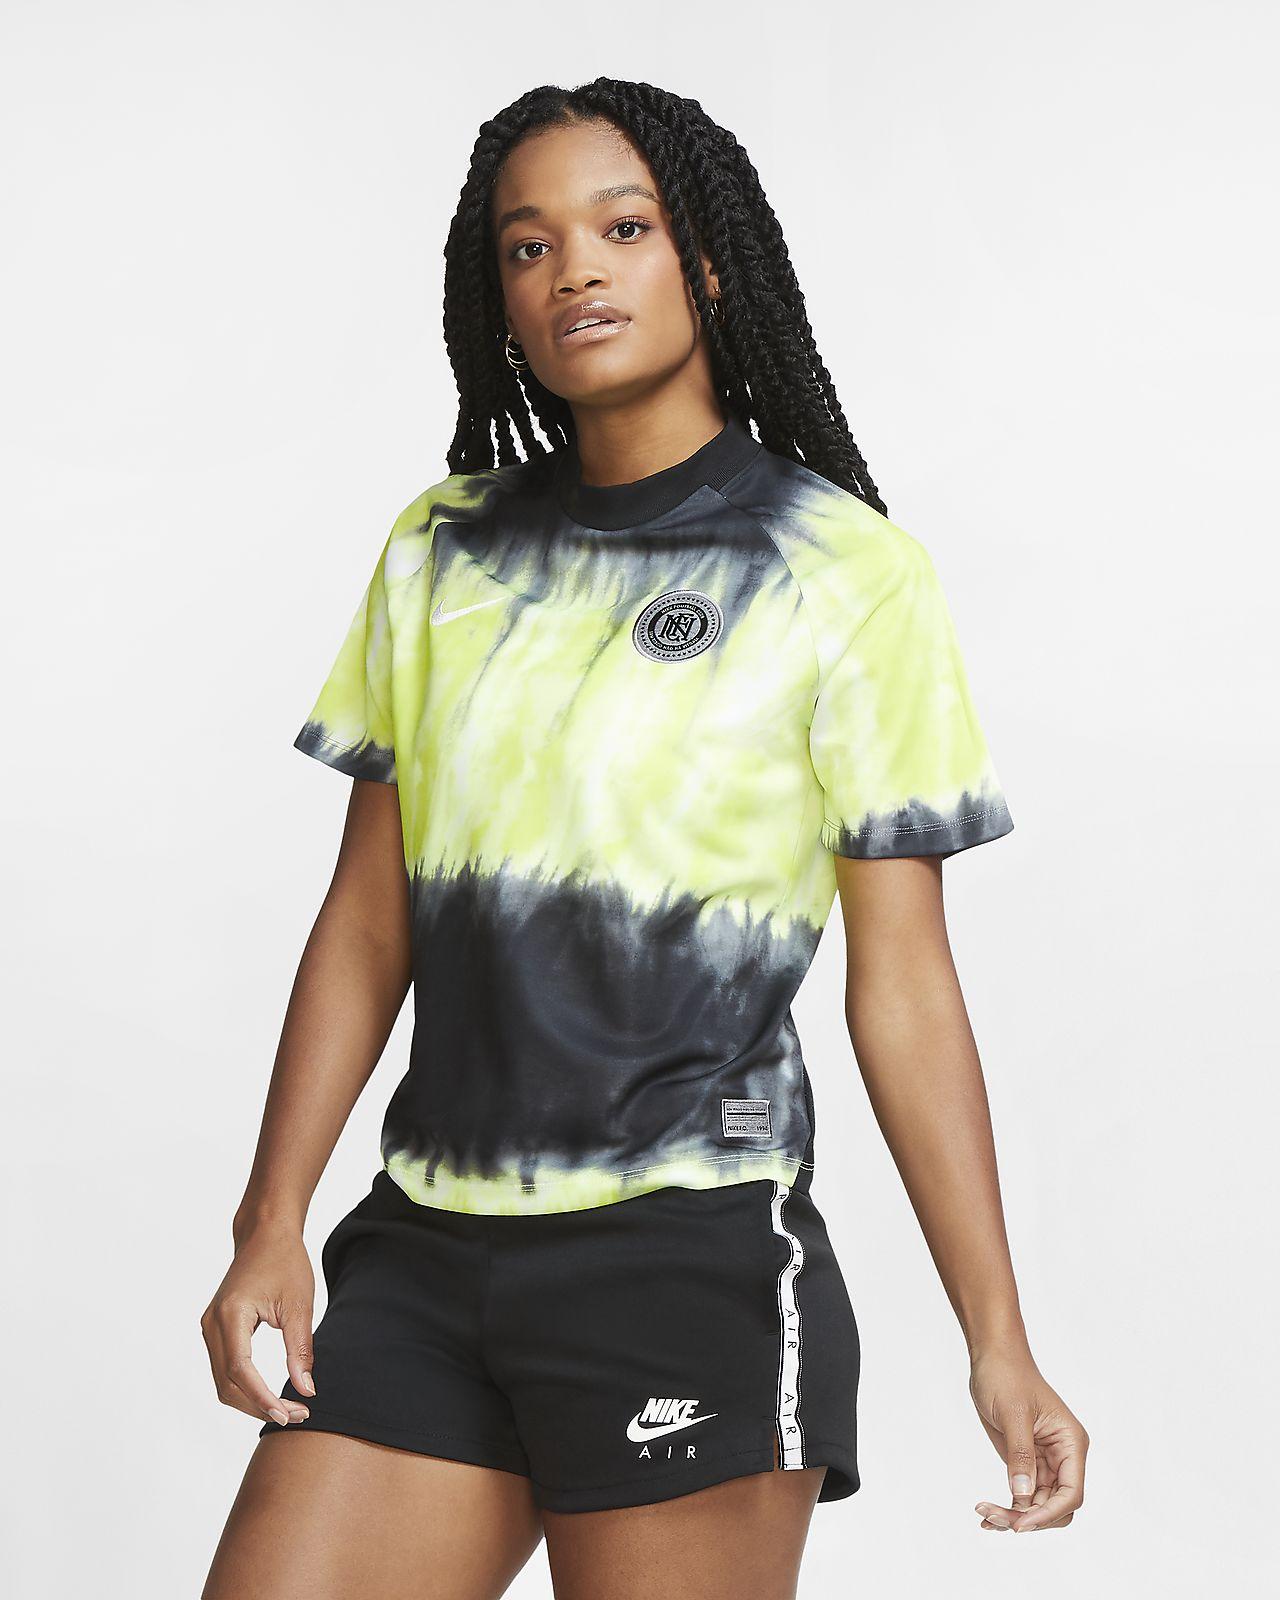 Nike F.C. Women's Tie-Dye Football Shirt